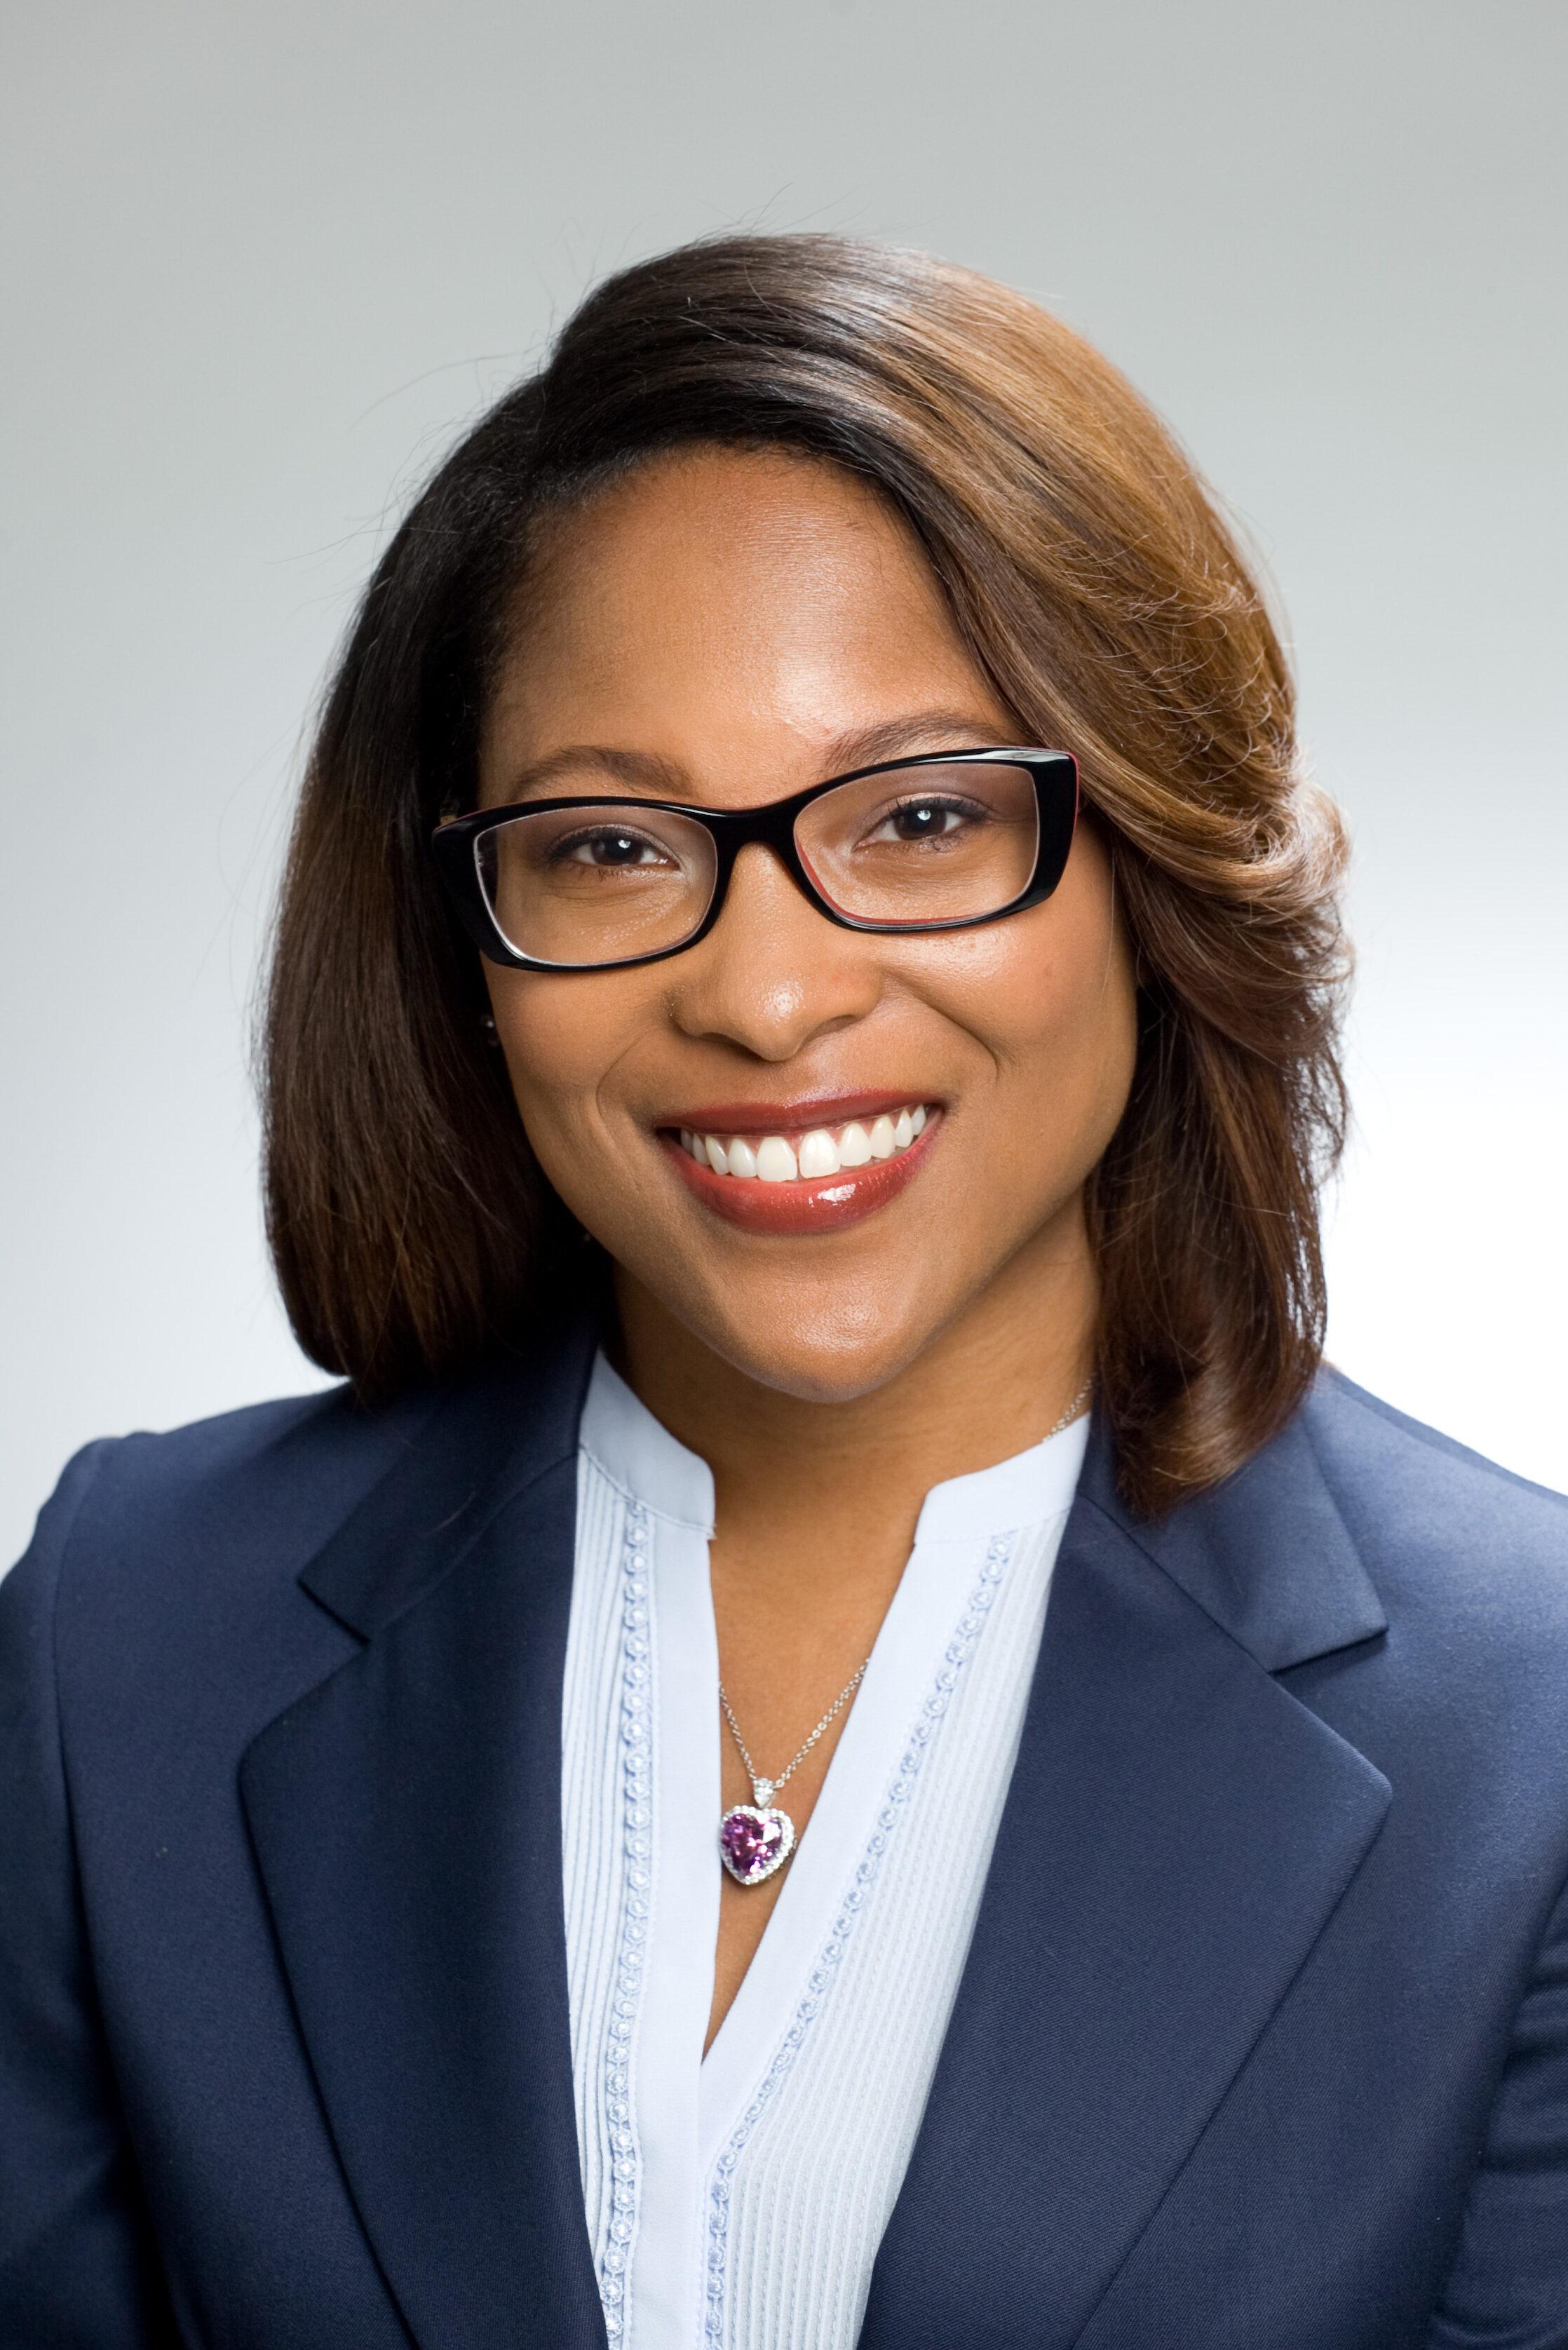 La'Vonda McLean (Panelist)